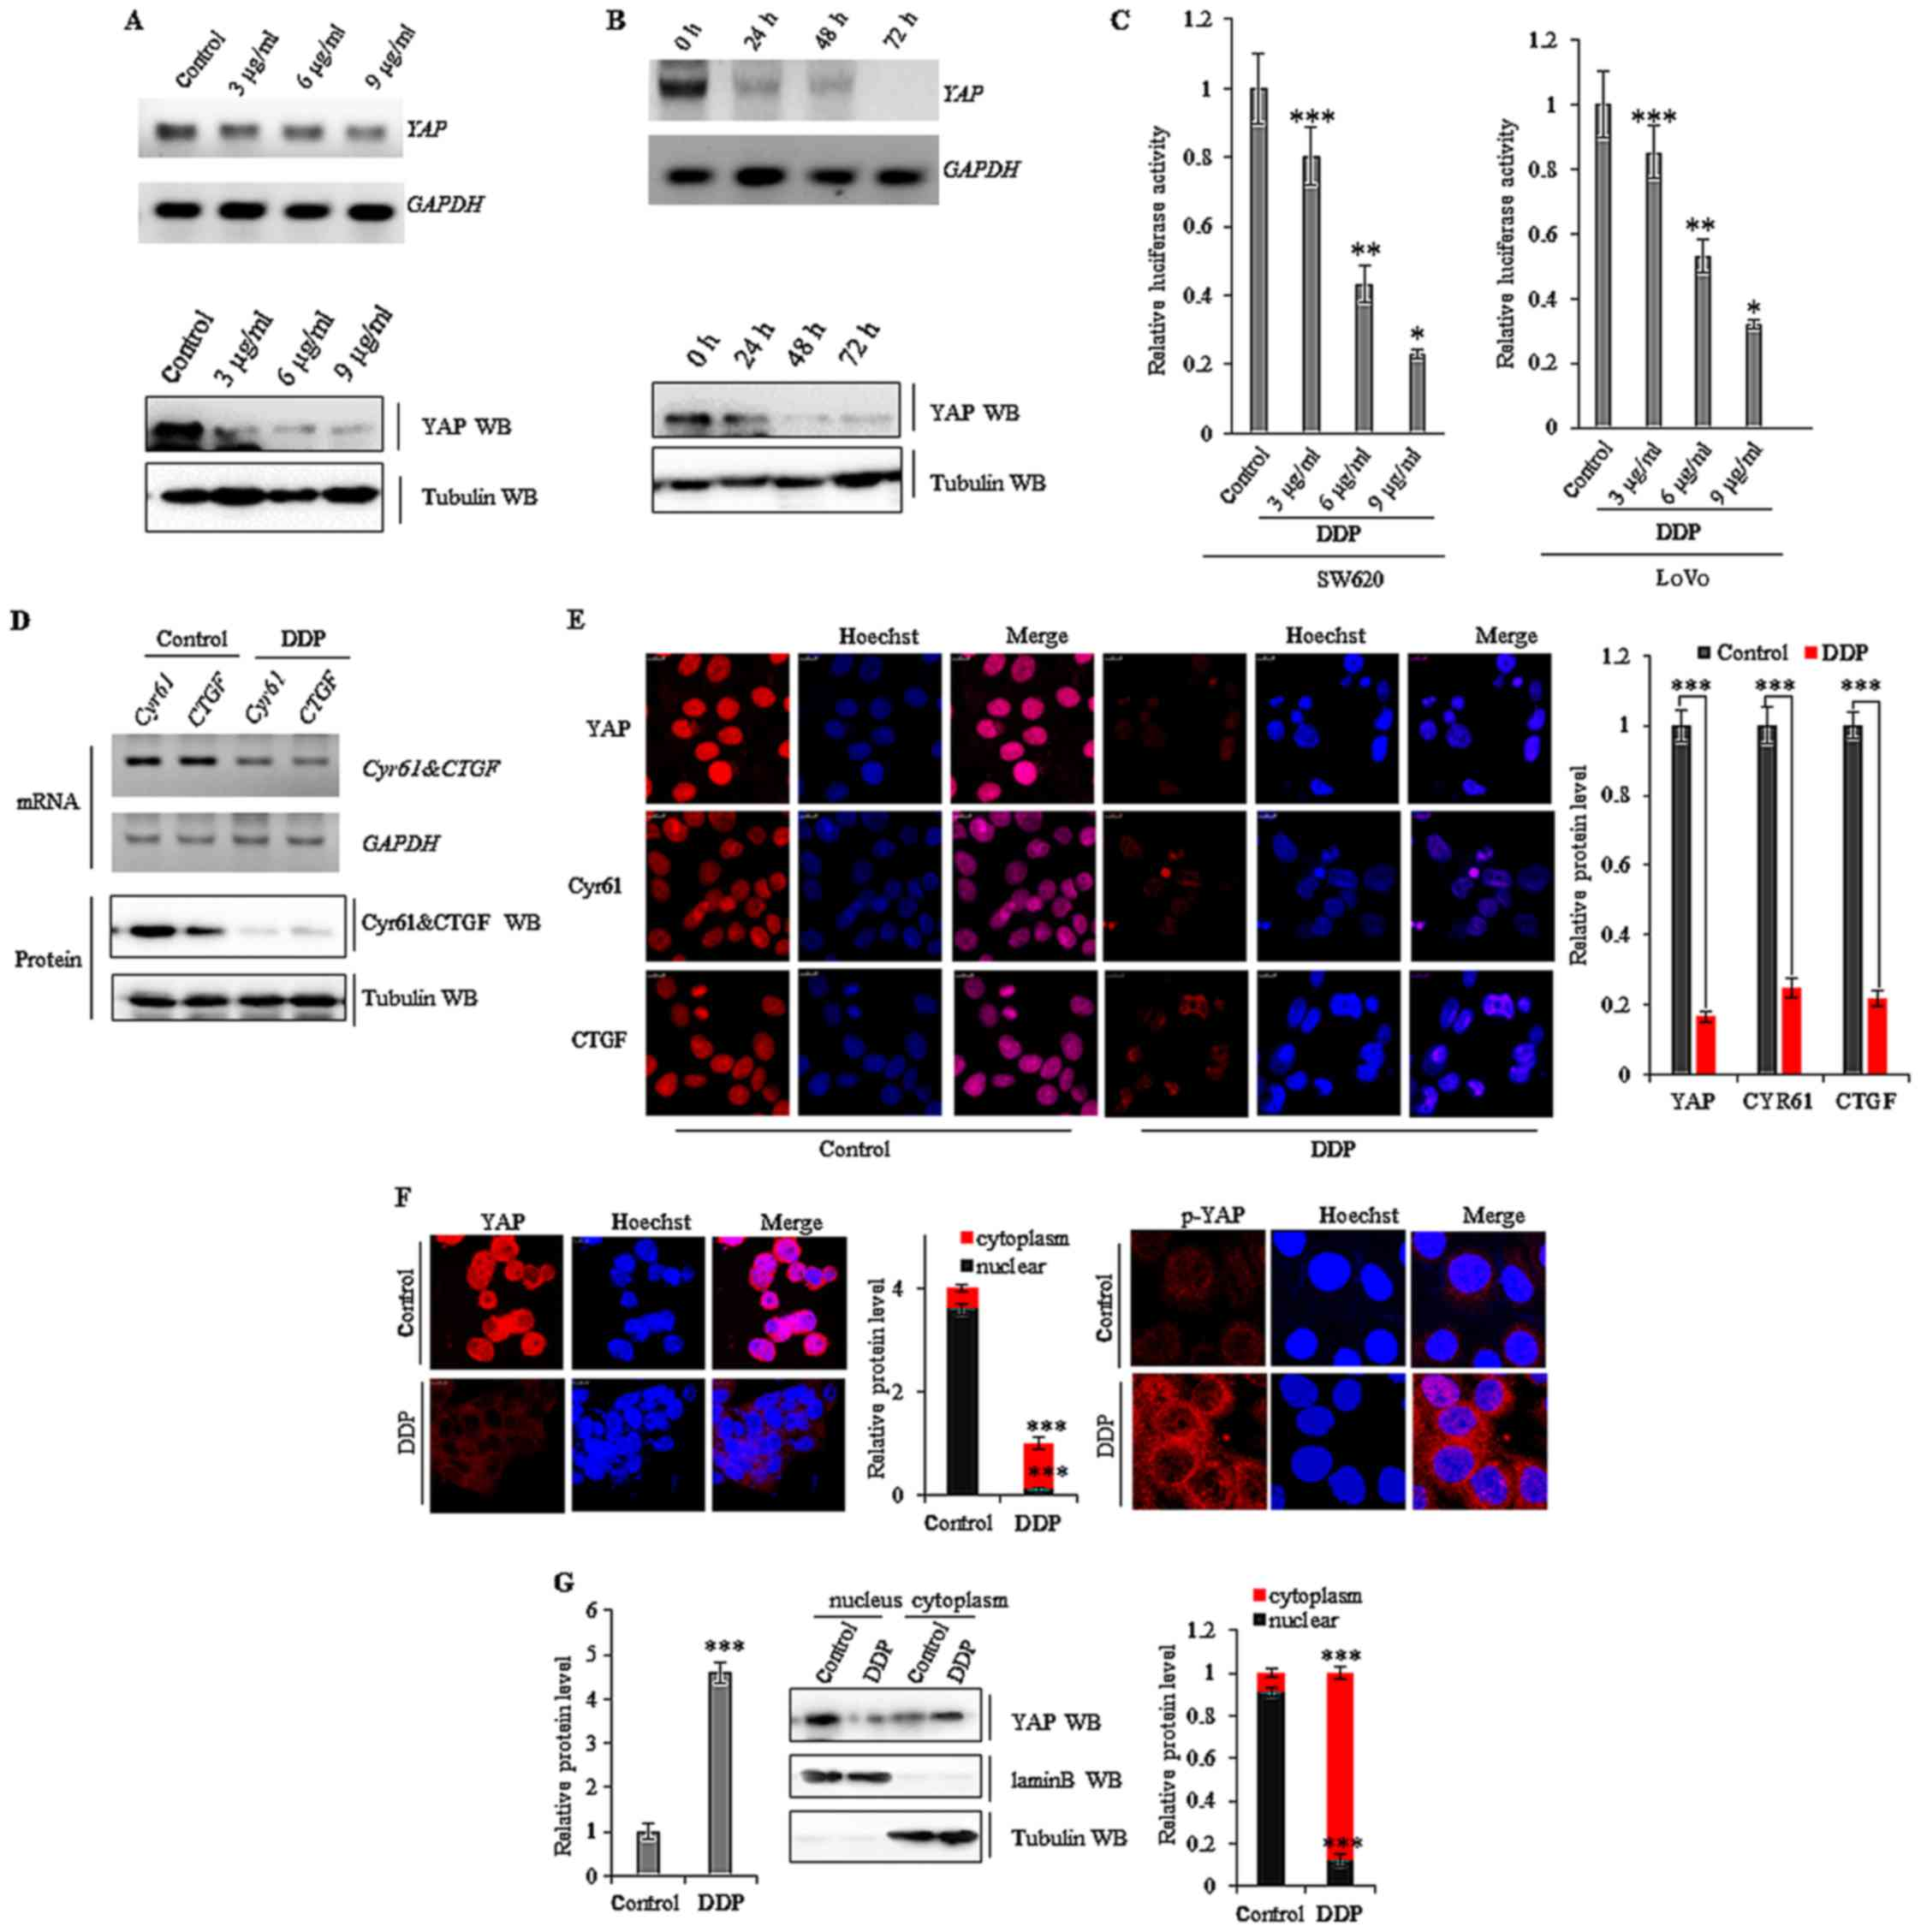 Suppression Of Yap By Ddp Disrupts Colon Tumor Progression